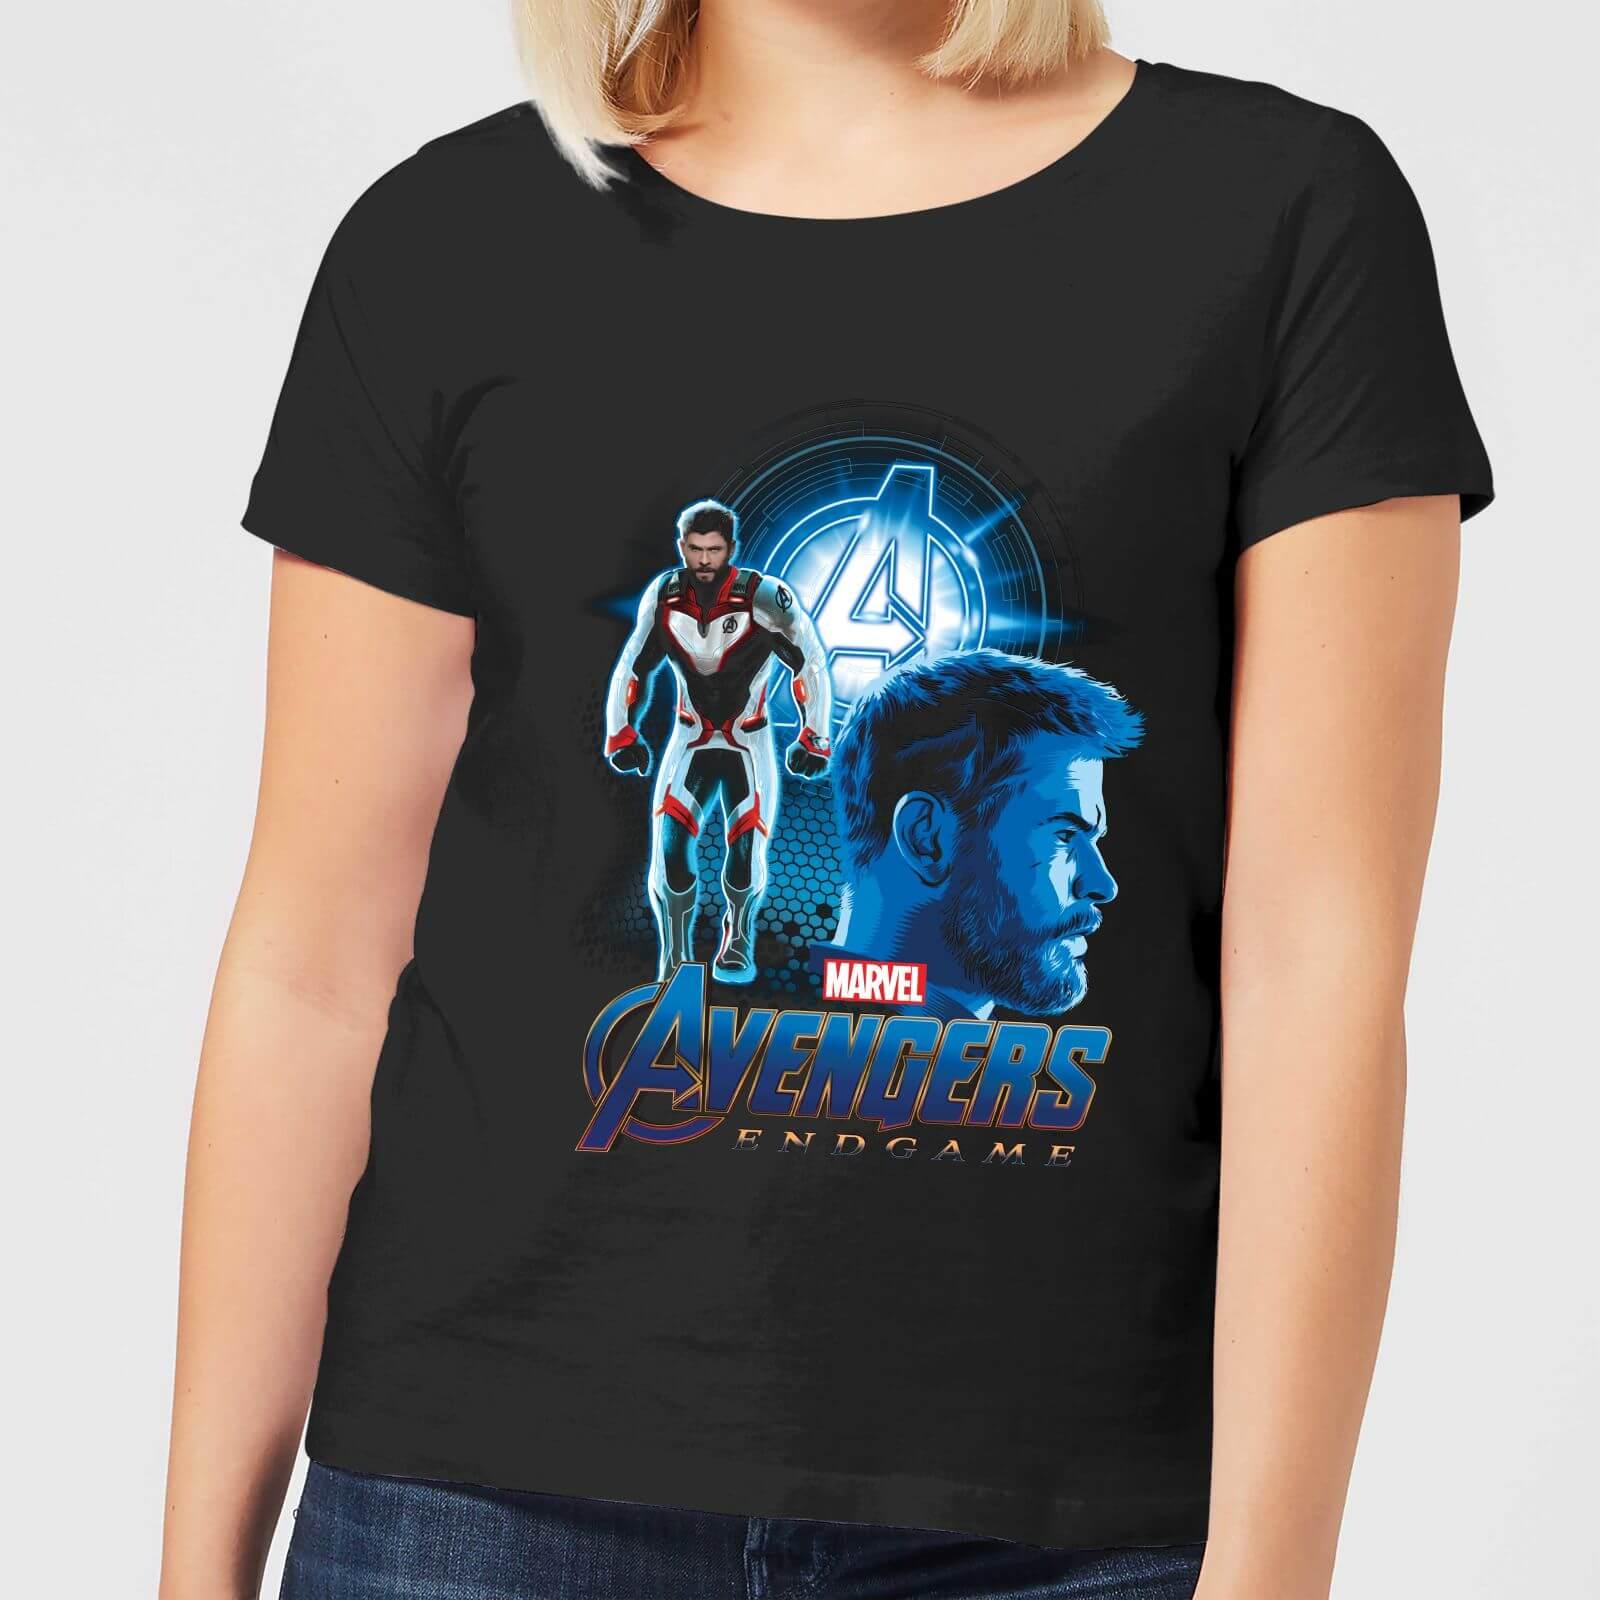 Endgame Mujer Traje Camiseta Negro Thor Vengadores Rq3A54Lj